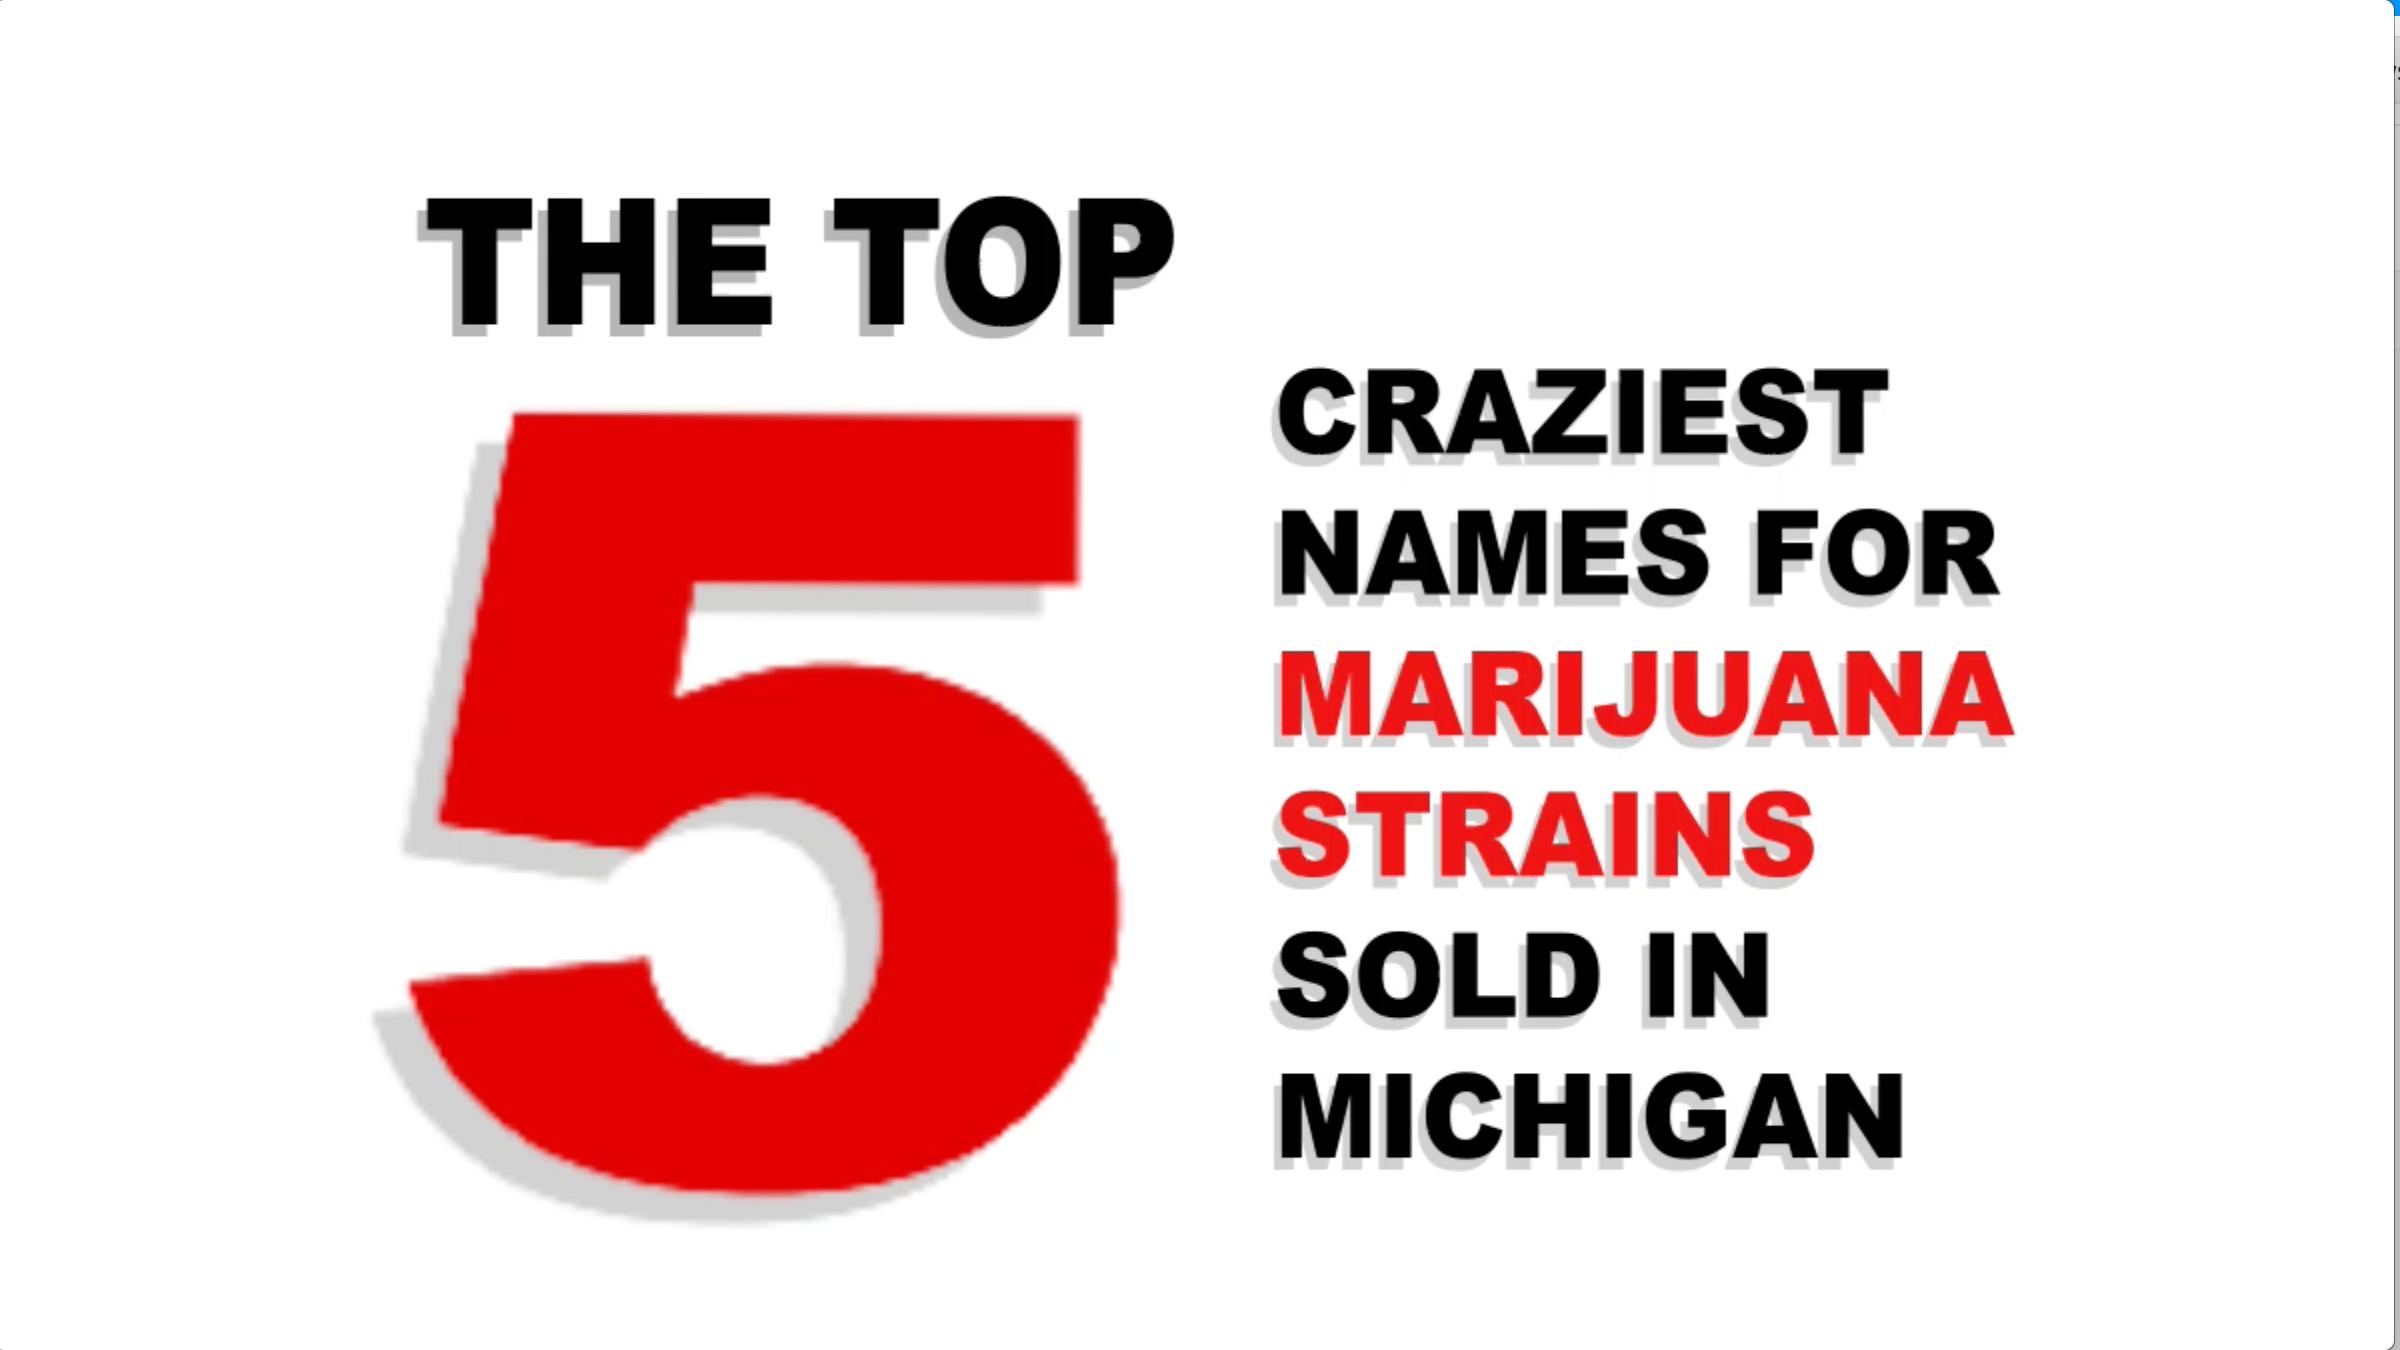 Michigan awards first marijuana licenses, paving way for December 1 sales